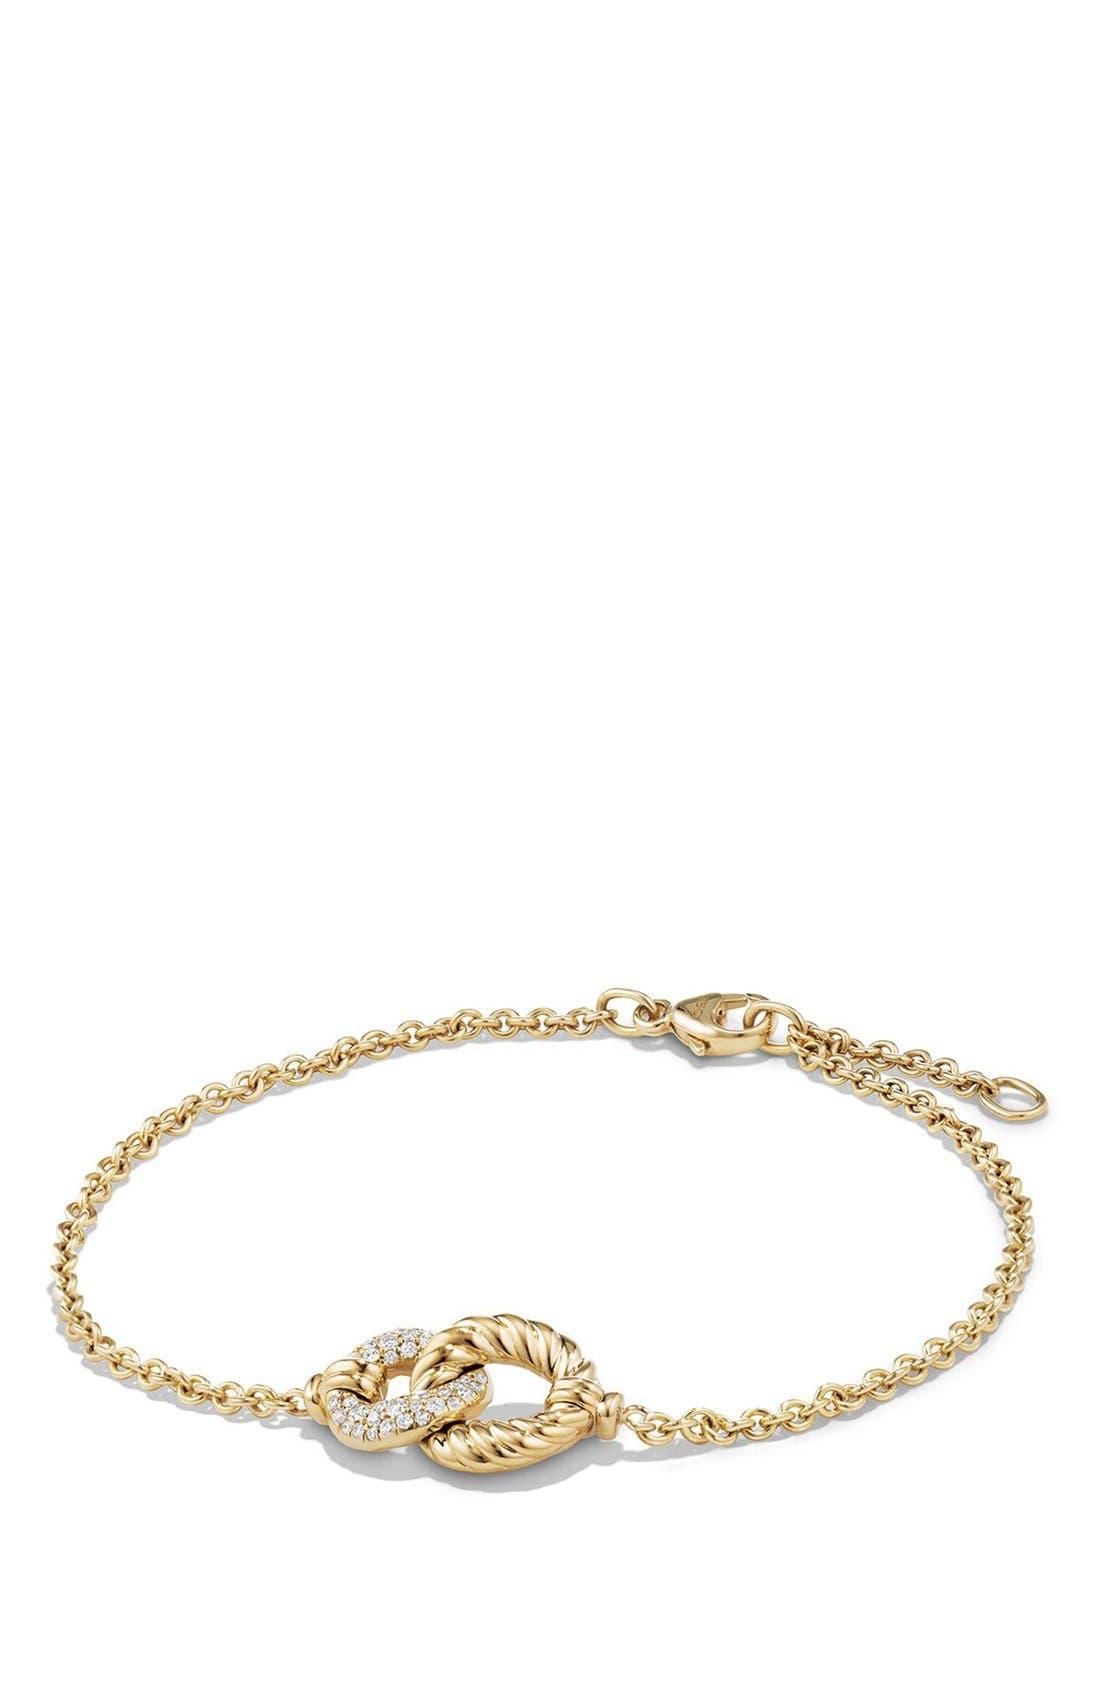 Belmont Single Station Bracelet,                             Main thumbnail 1, color,                             Yellow Gold/ Diamond